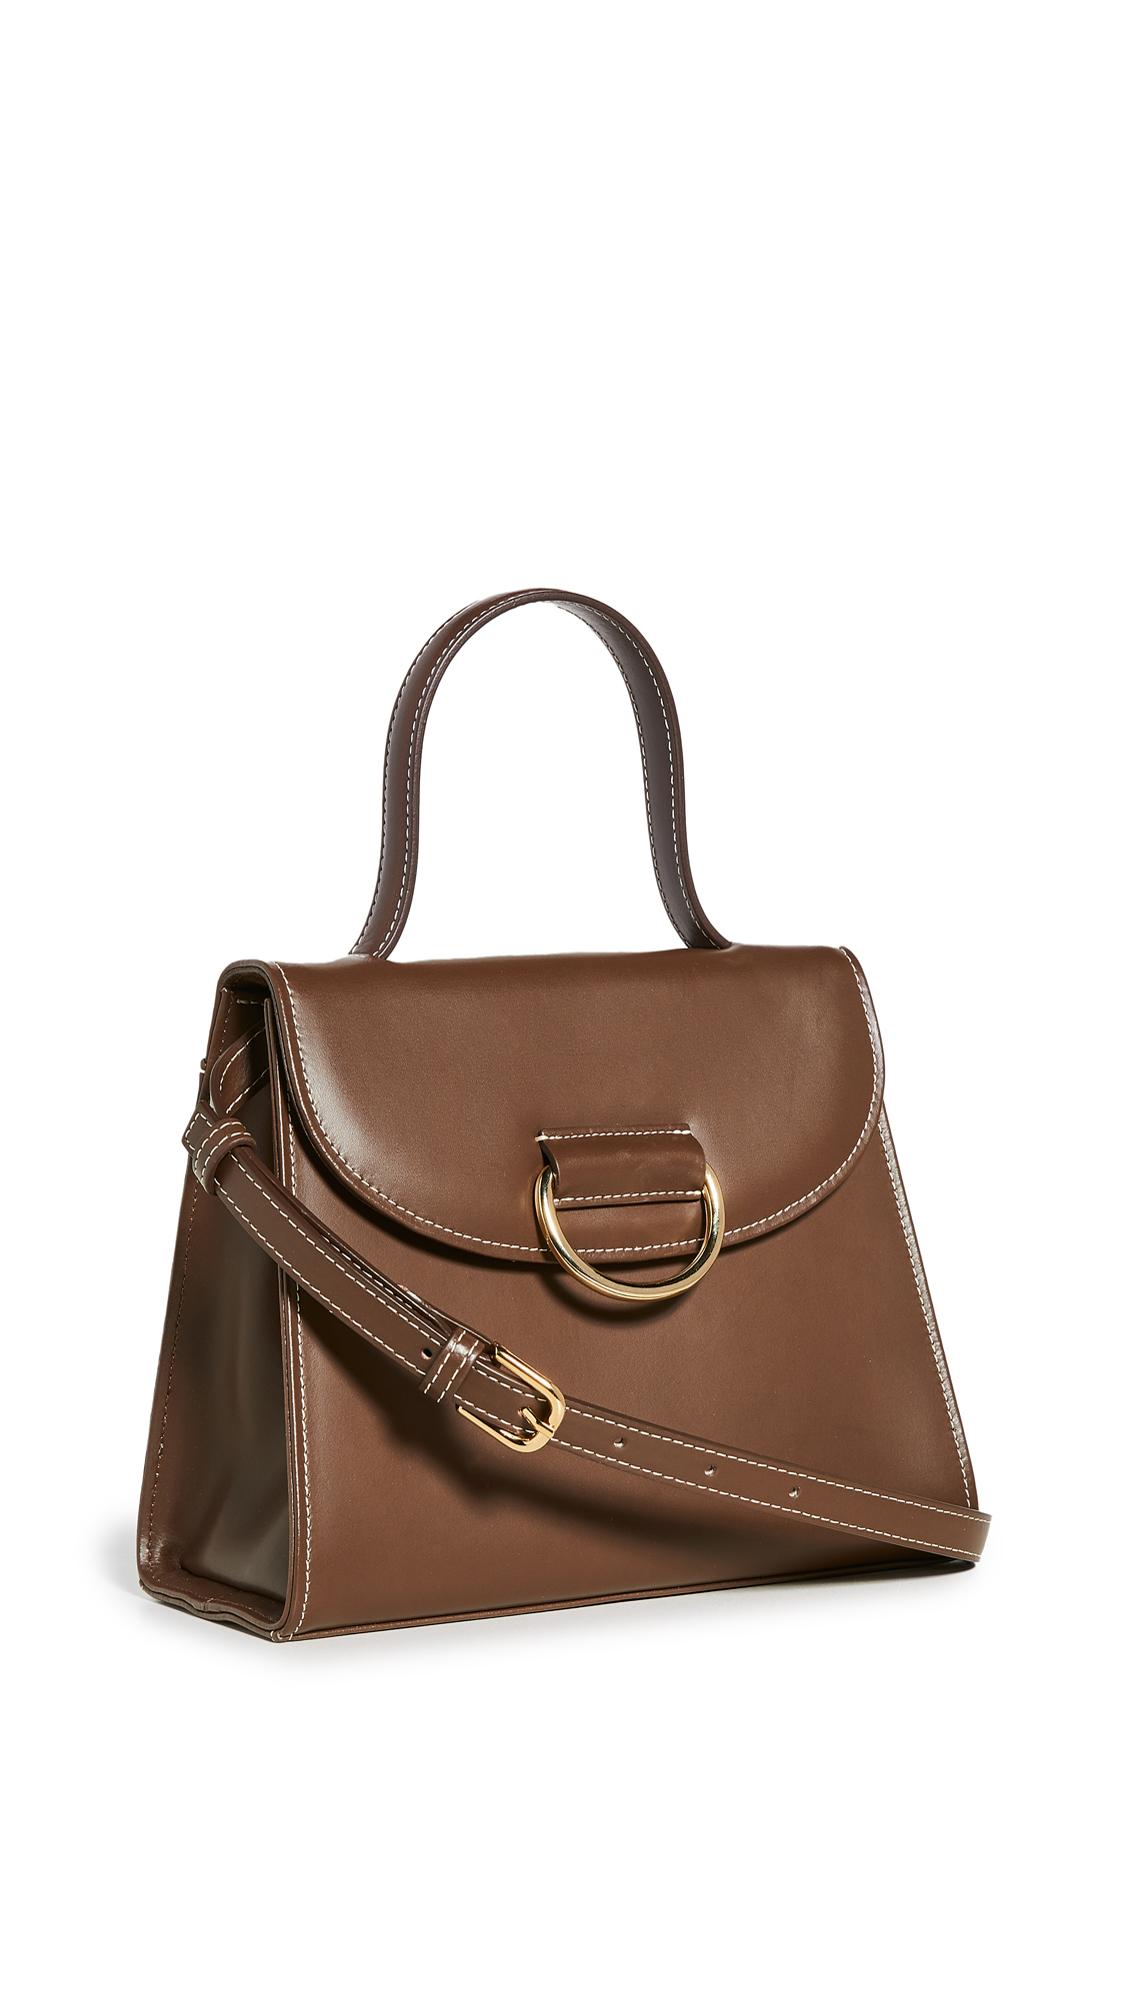 Little Liffner Lady Bag